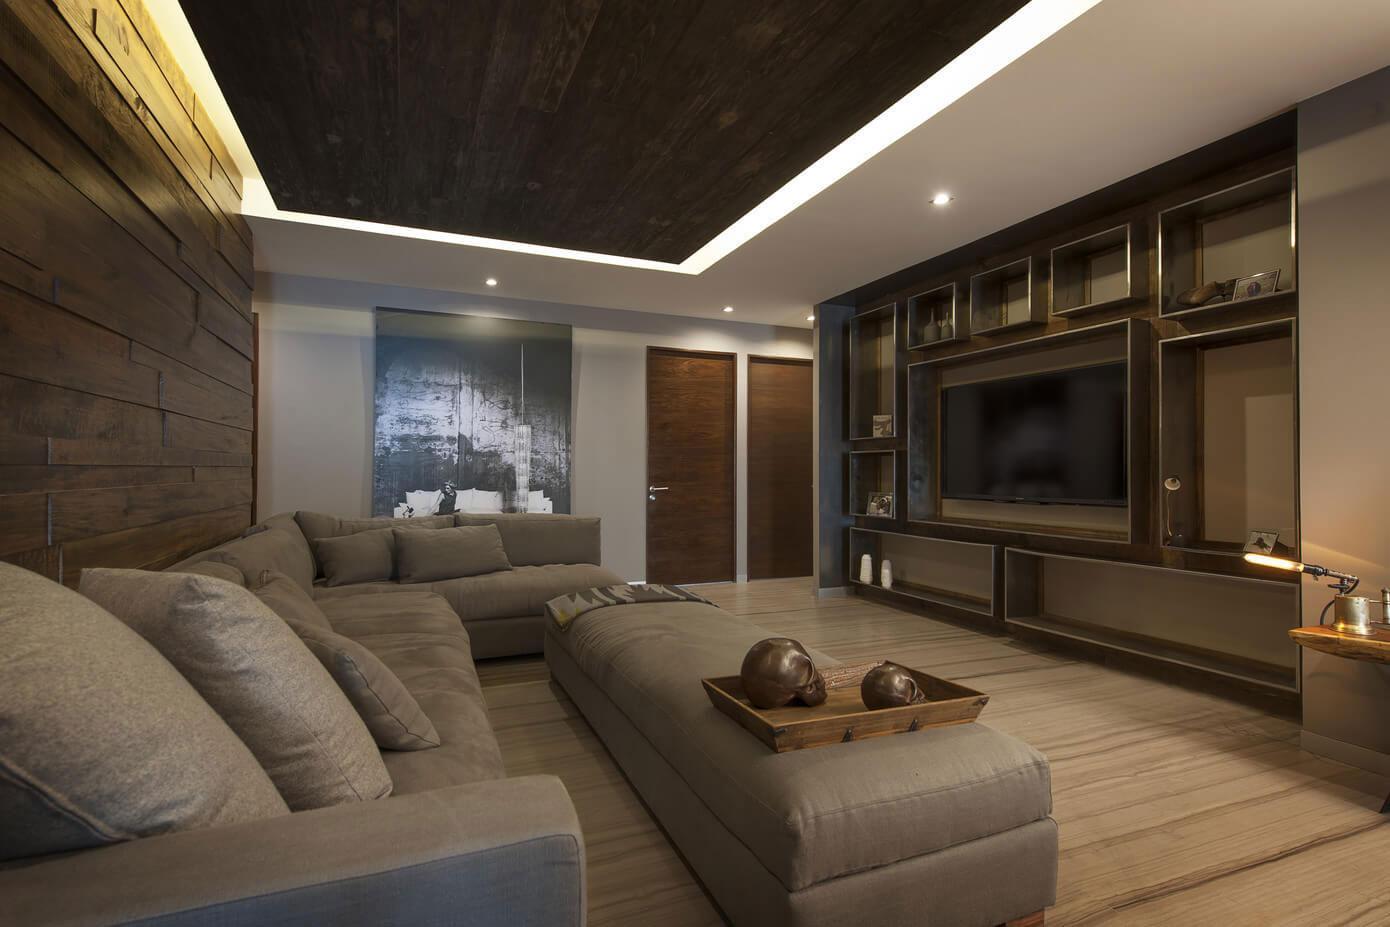 Contemporary CM Apartment in Mexico City by Kababie Arquitectos-02